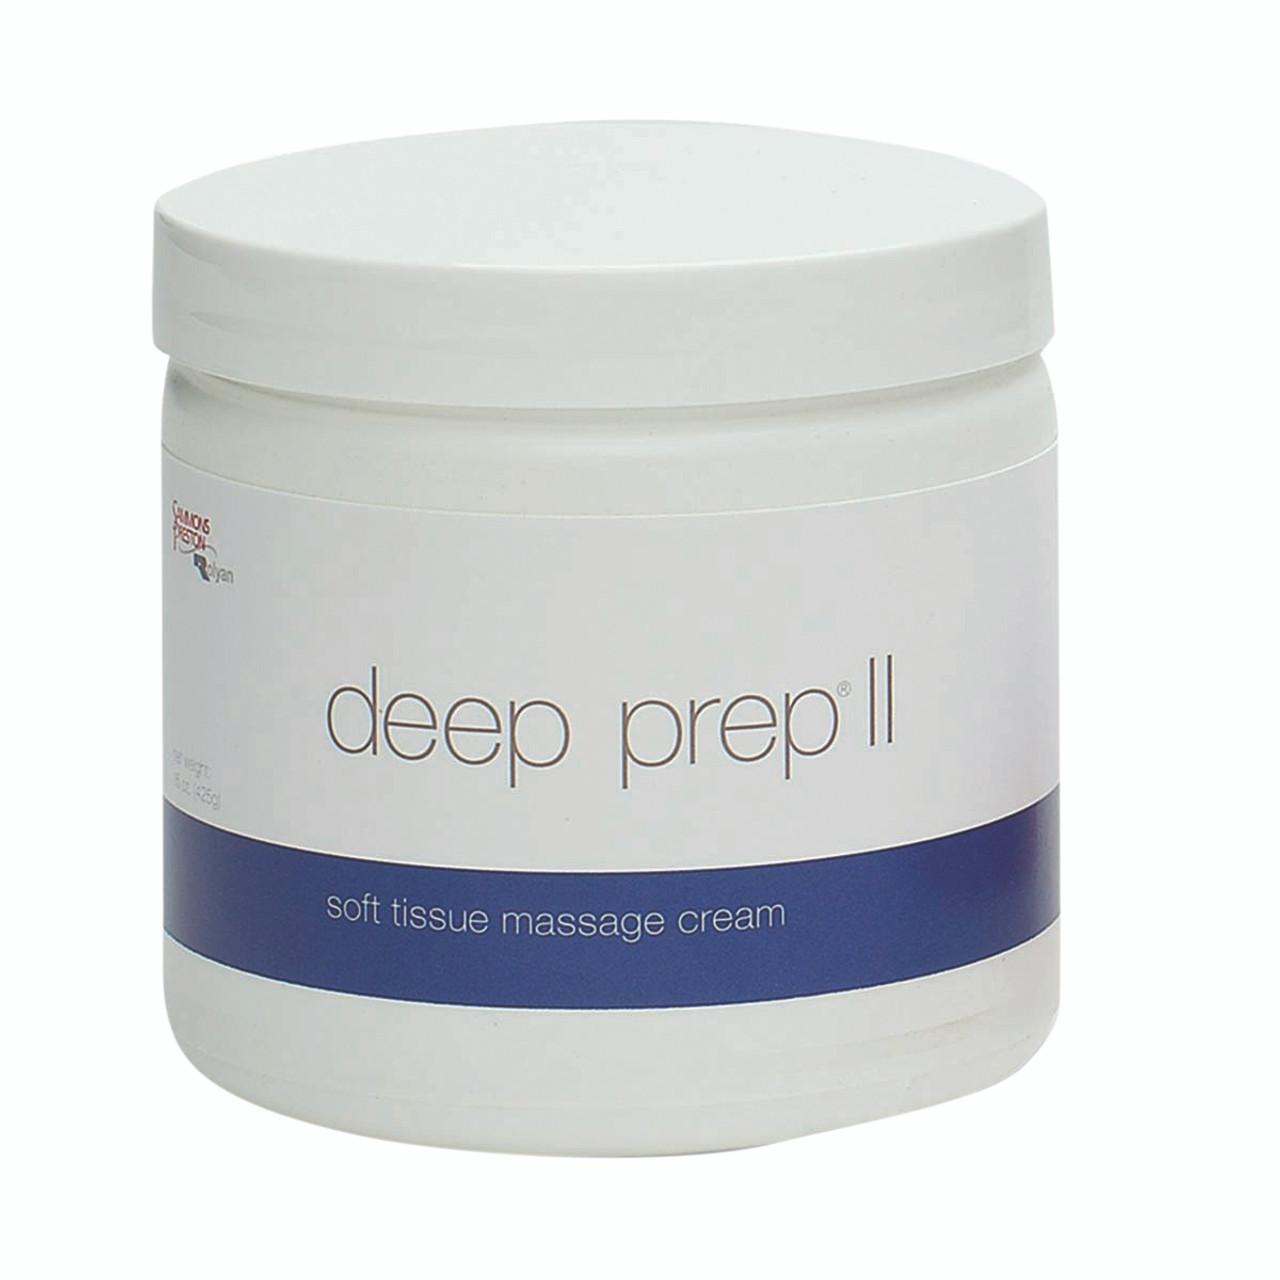 Deep Prep¨ Massage Cream - II cream, 15 oz jar